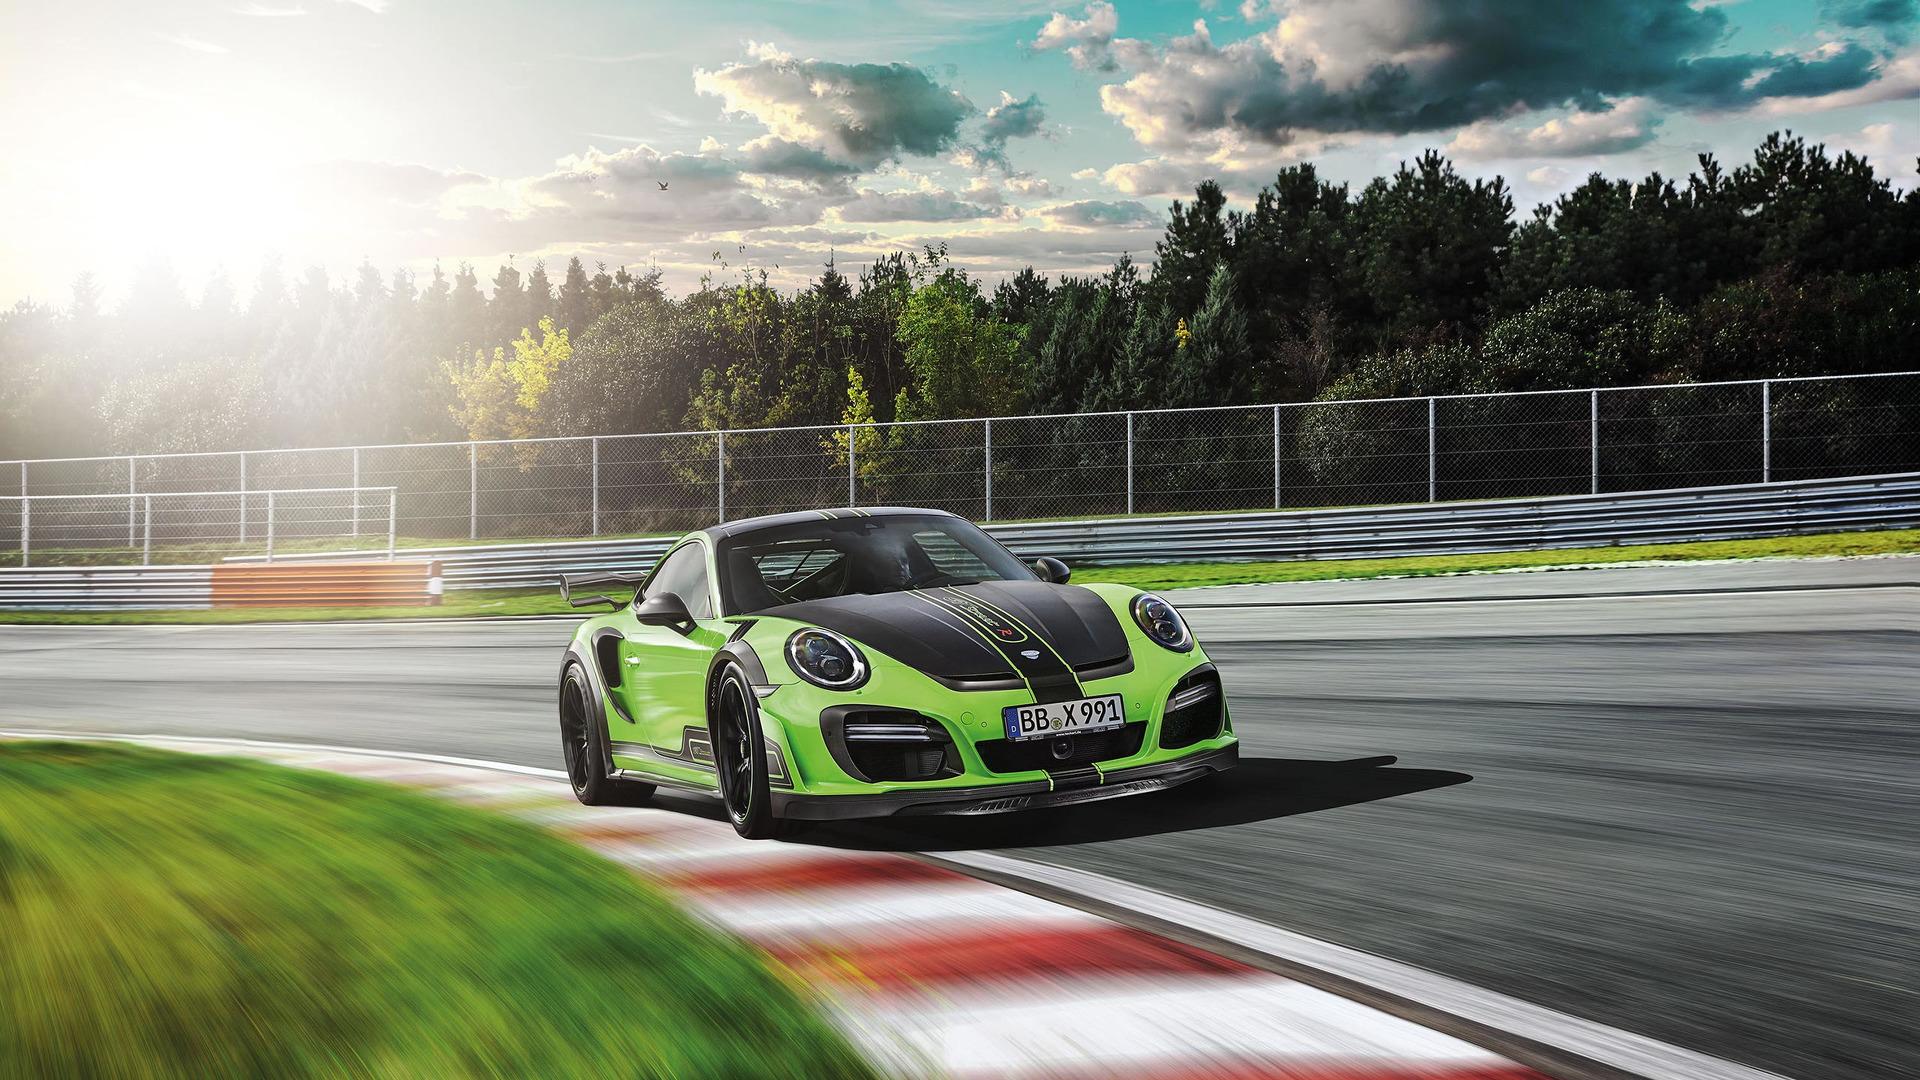 Tuned Porsche 911 Turbo Has 711 Hp High Tech Exhaust Makes It Sing